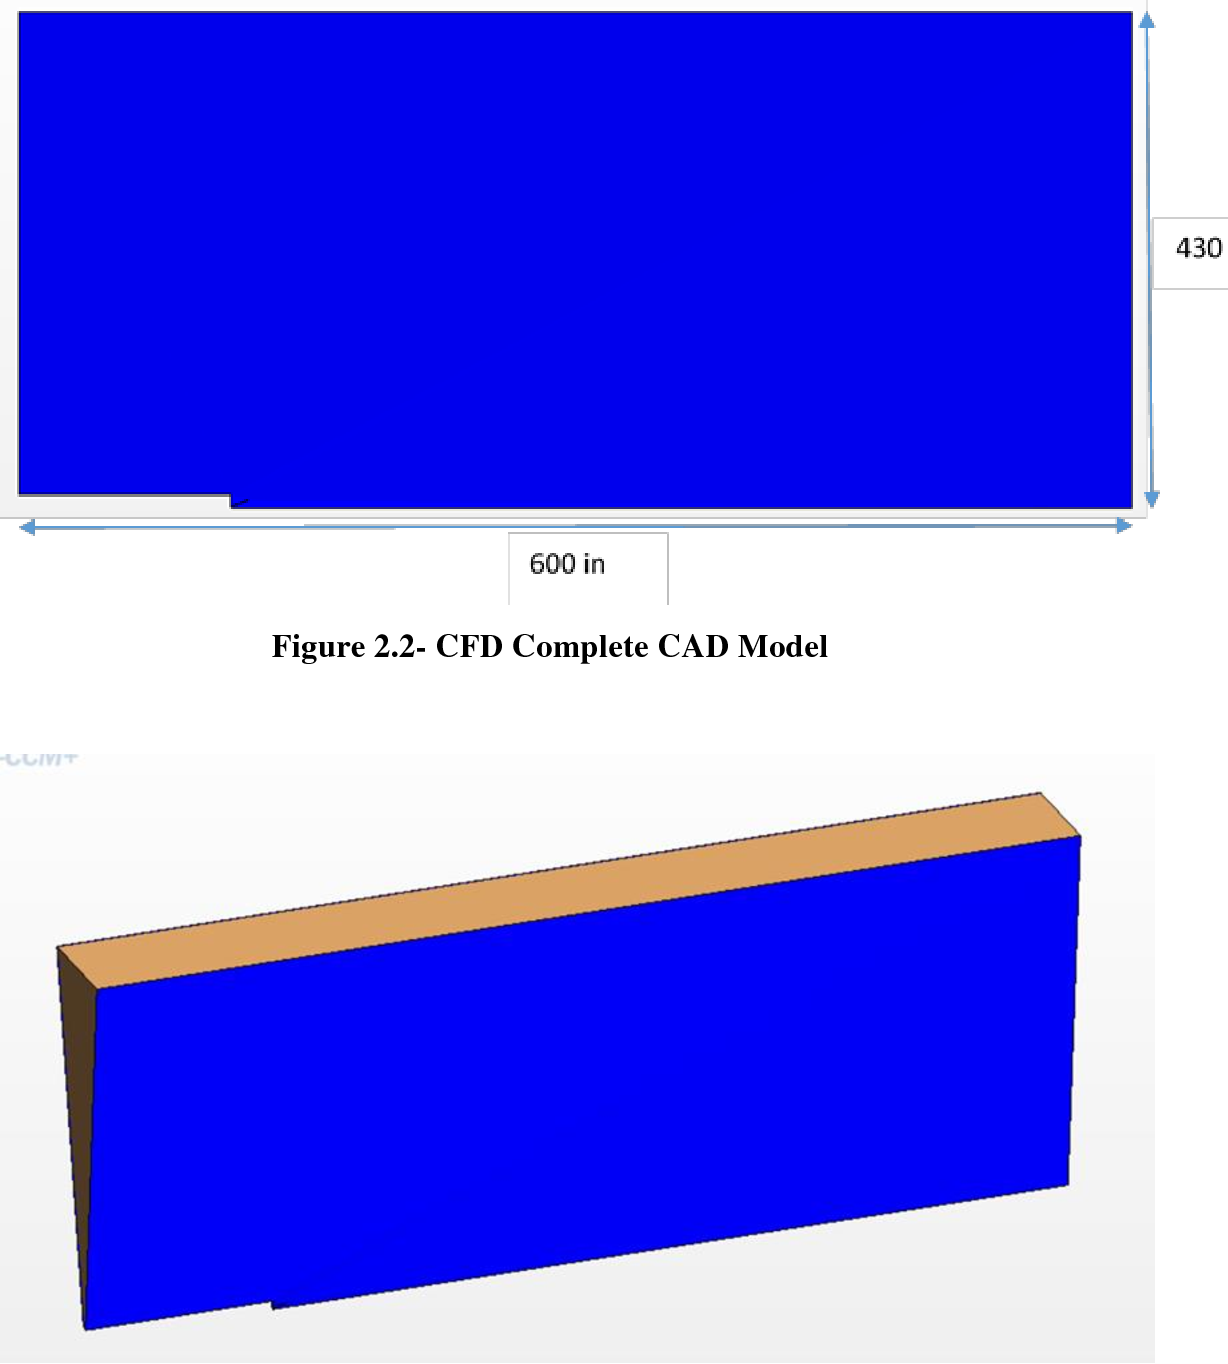 Figure 2.2- CFD Complete CAD Model